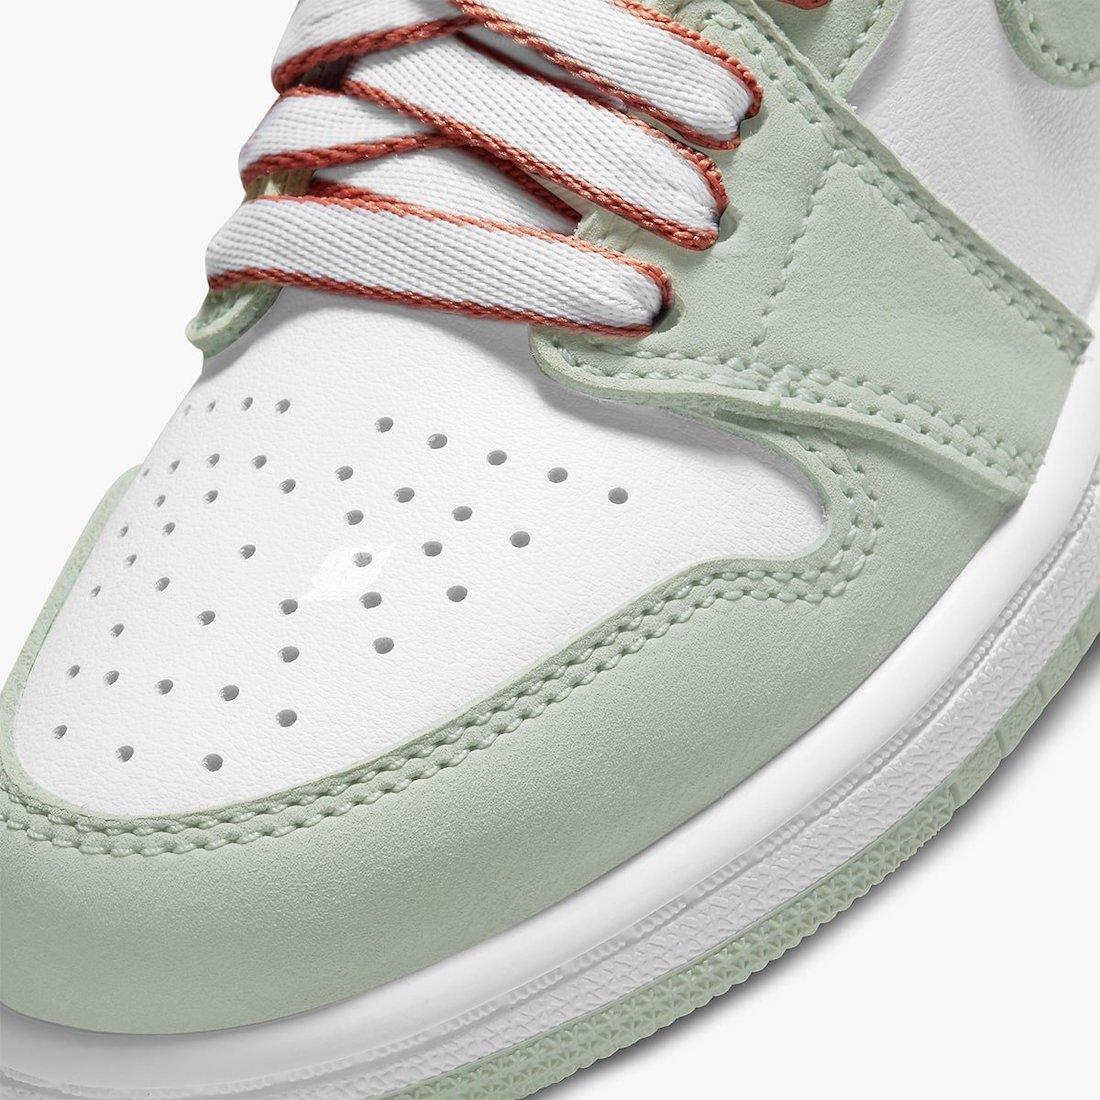 Air Jordan 1 High OG Seafoam Release Date